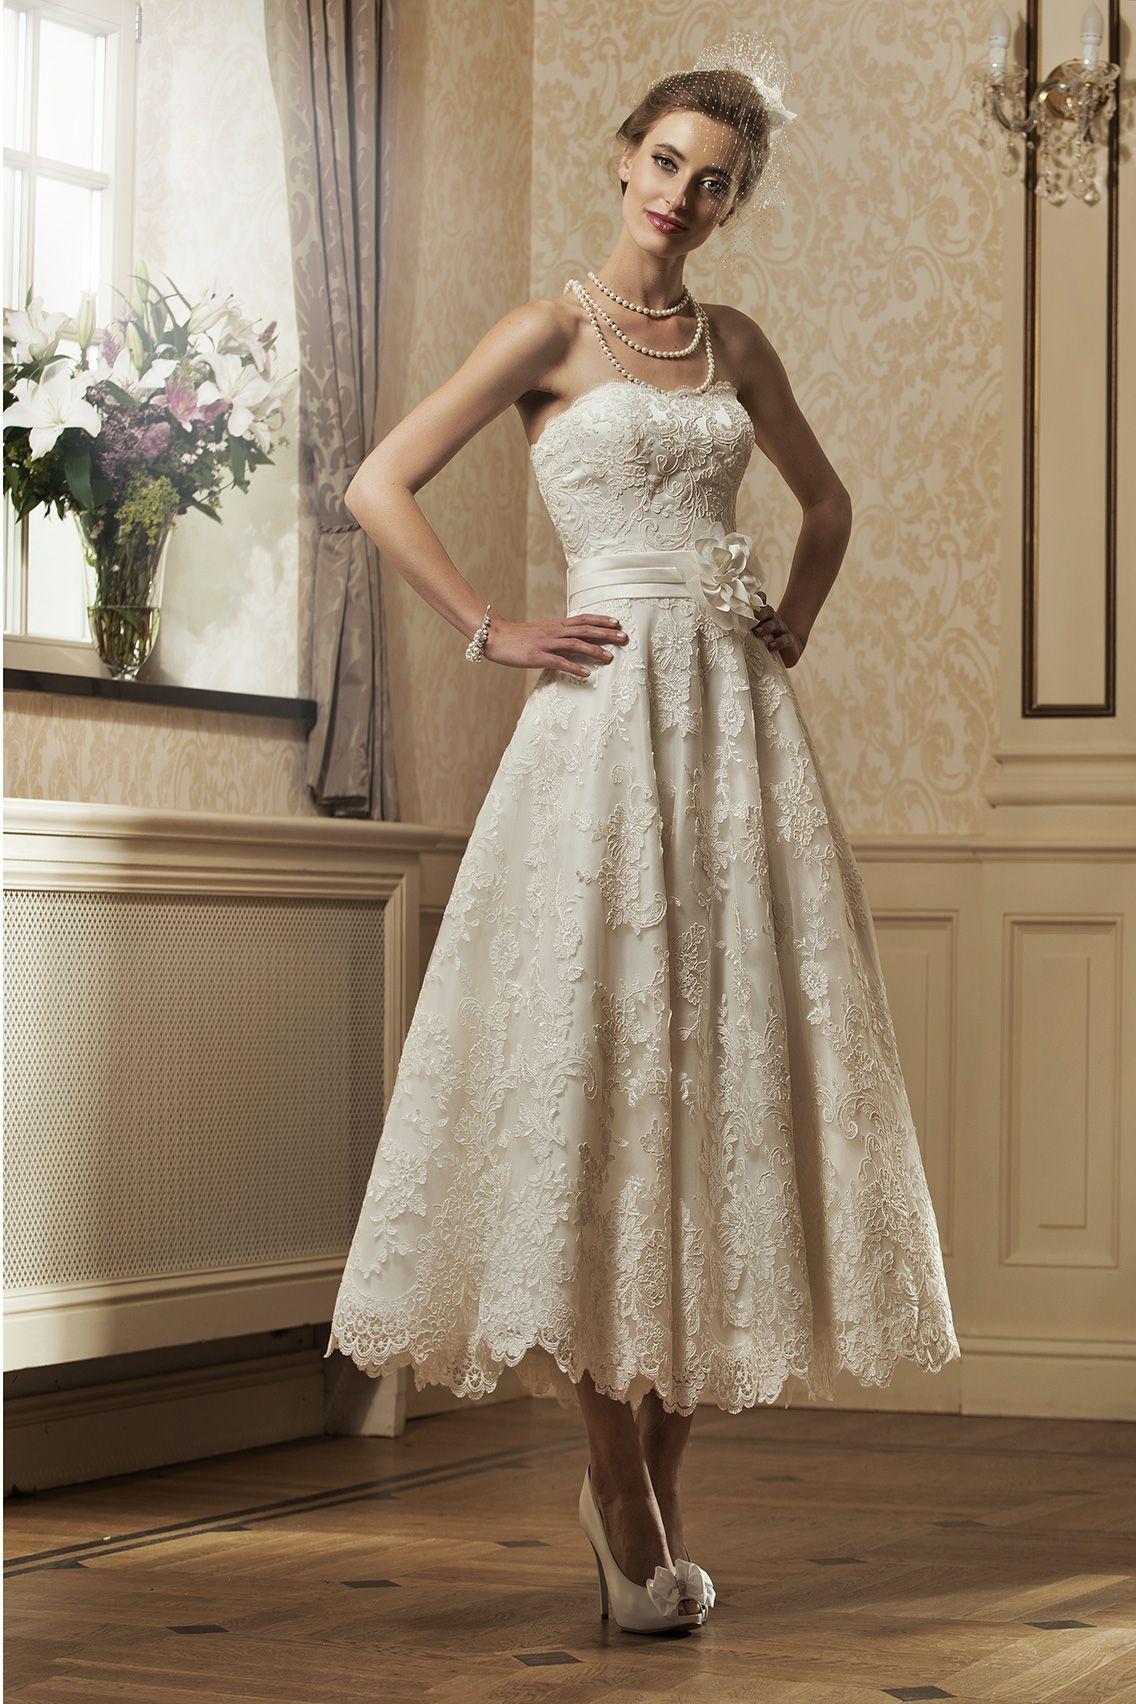 Wedding dresses tea length  Pin by natalie palibroda on wedding dresses  Pinterest  Wedding